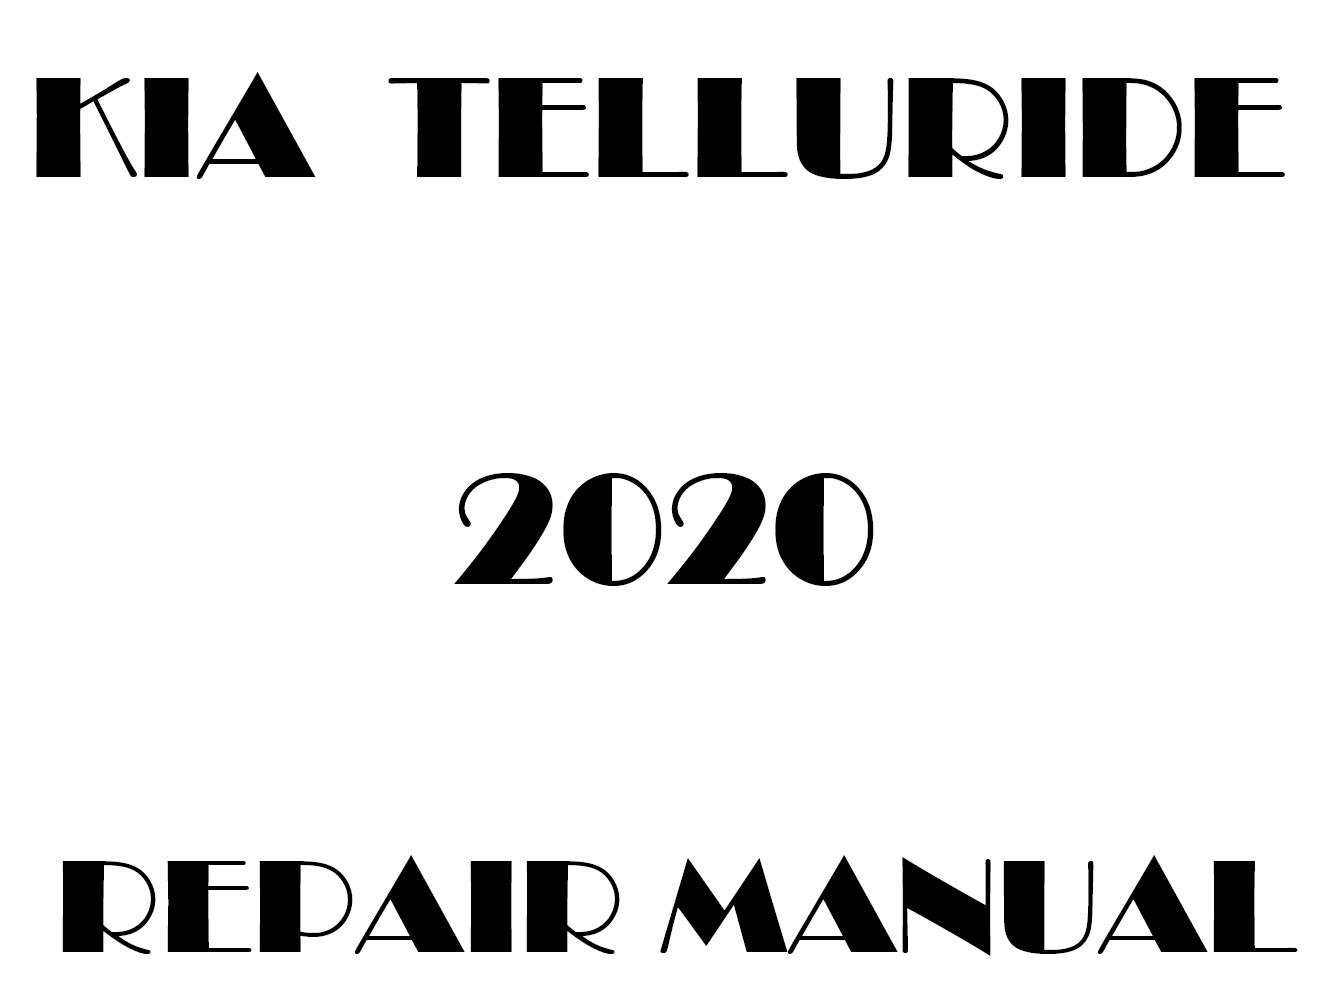 2020 Kia Telluride factory repair manual